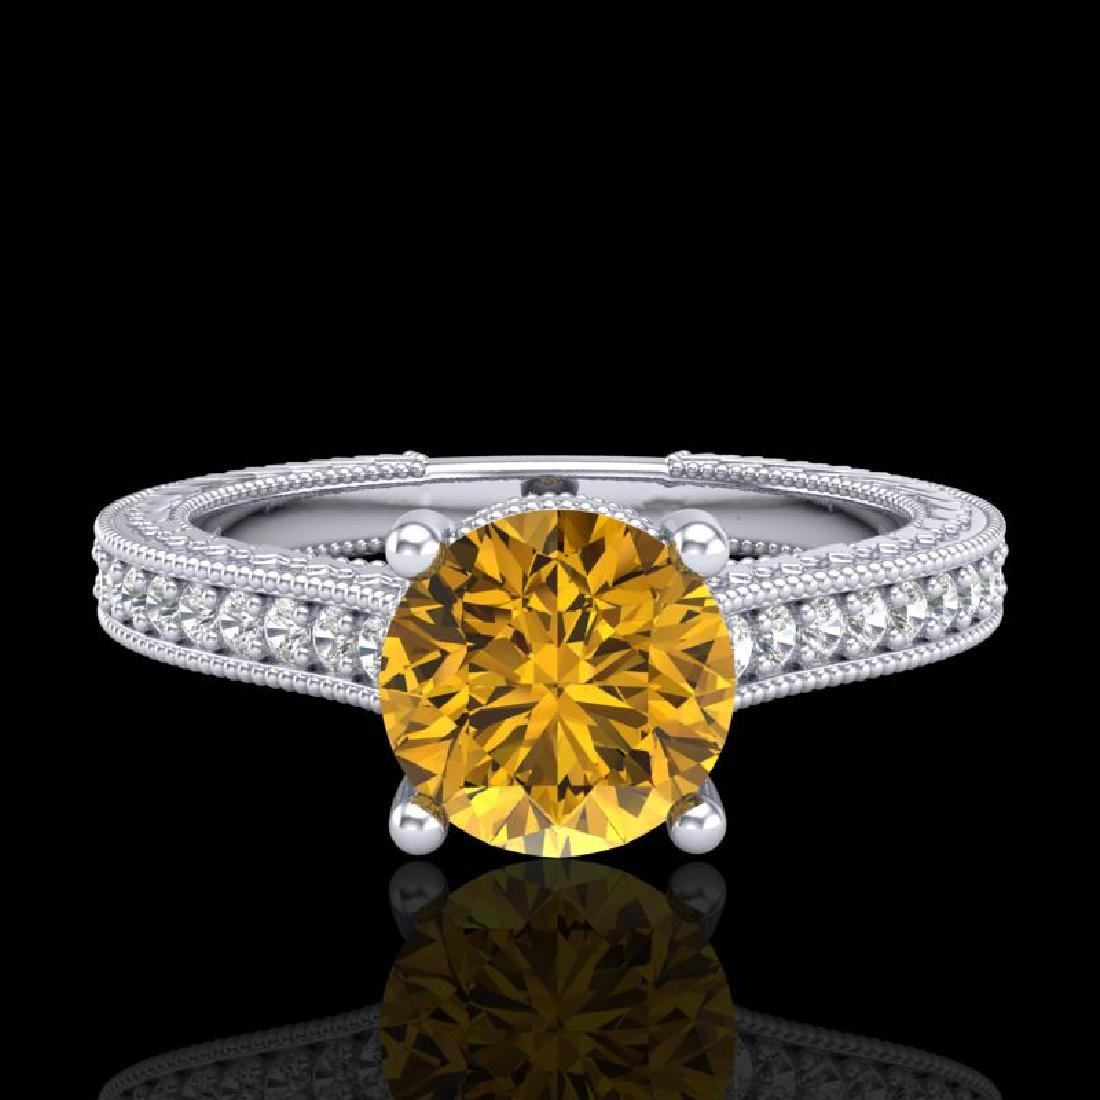 1.45 CTW Intense Fancy Yellow Diamond Engagement Art - 2